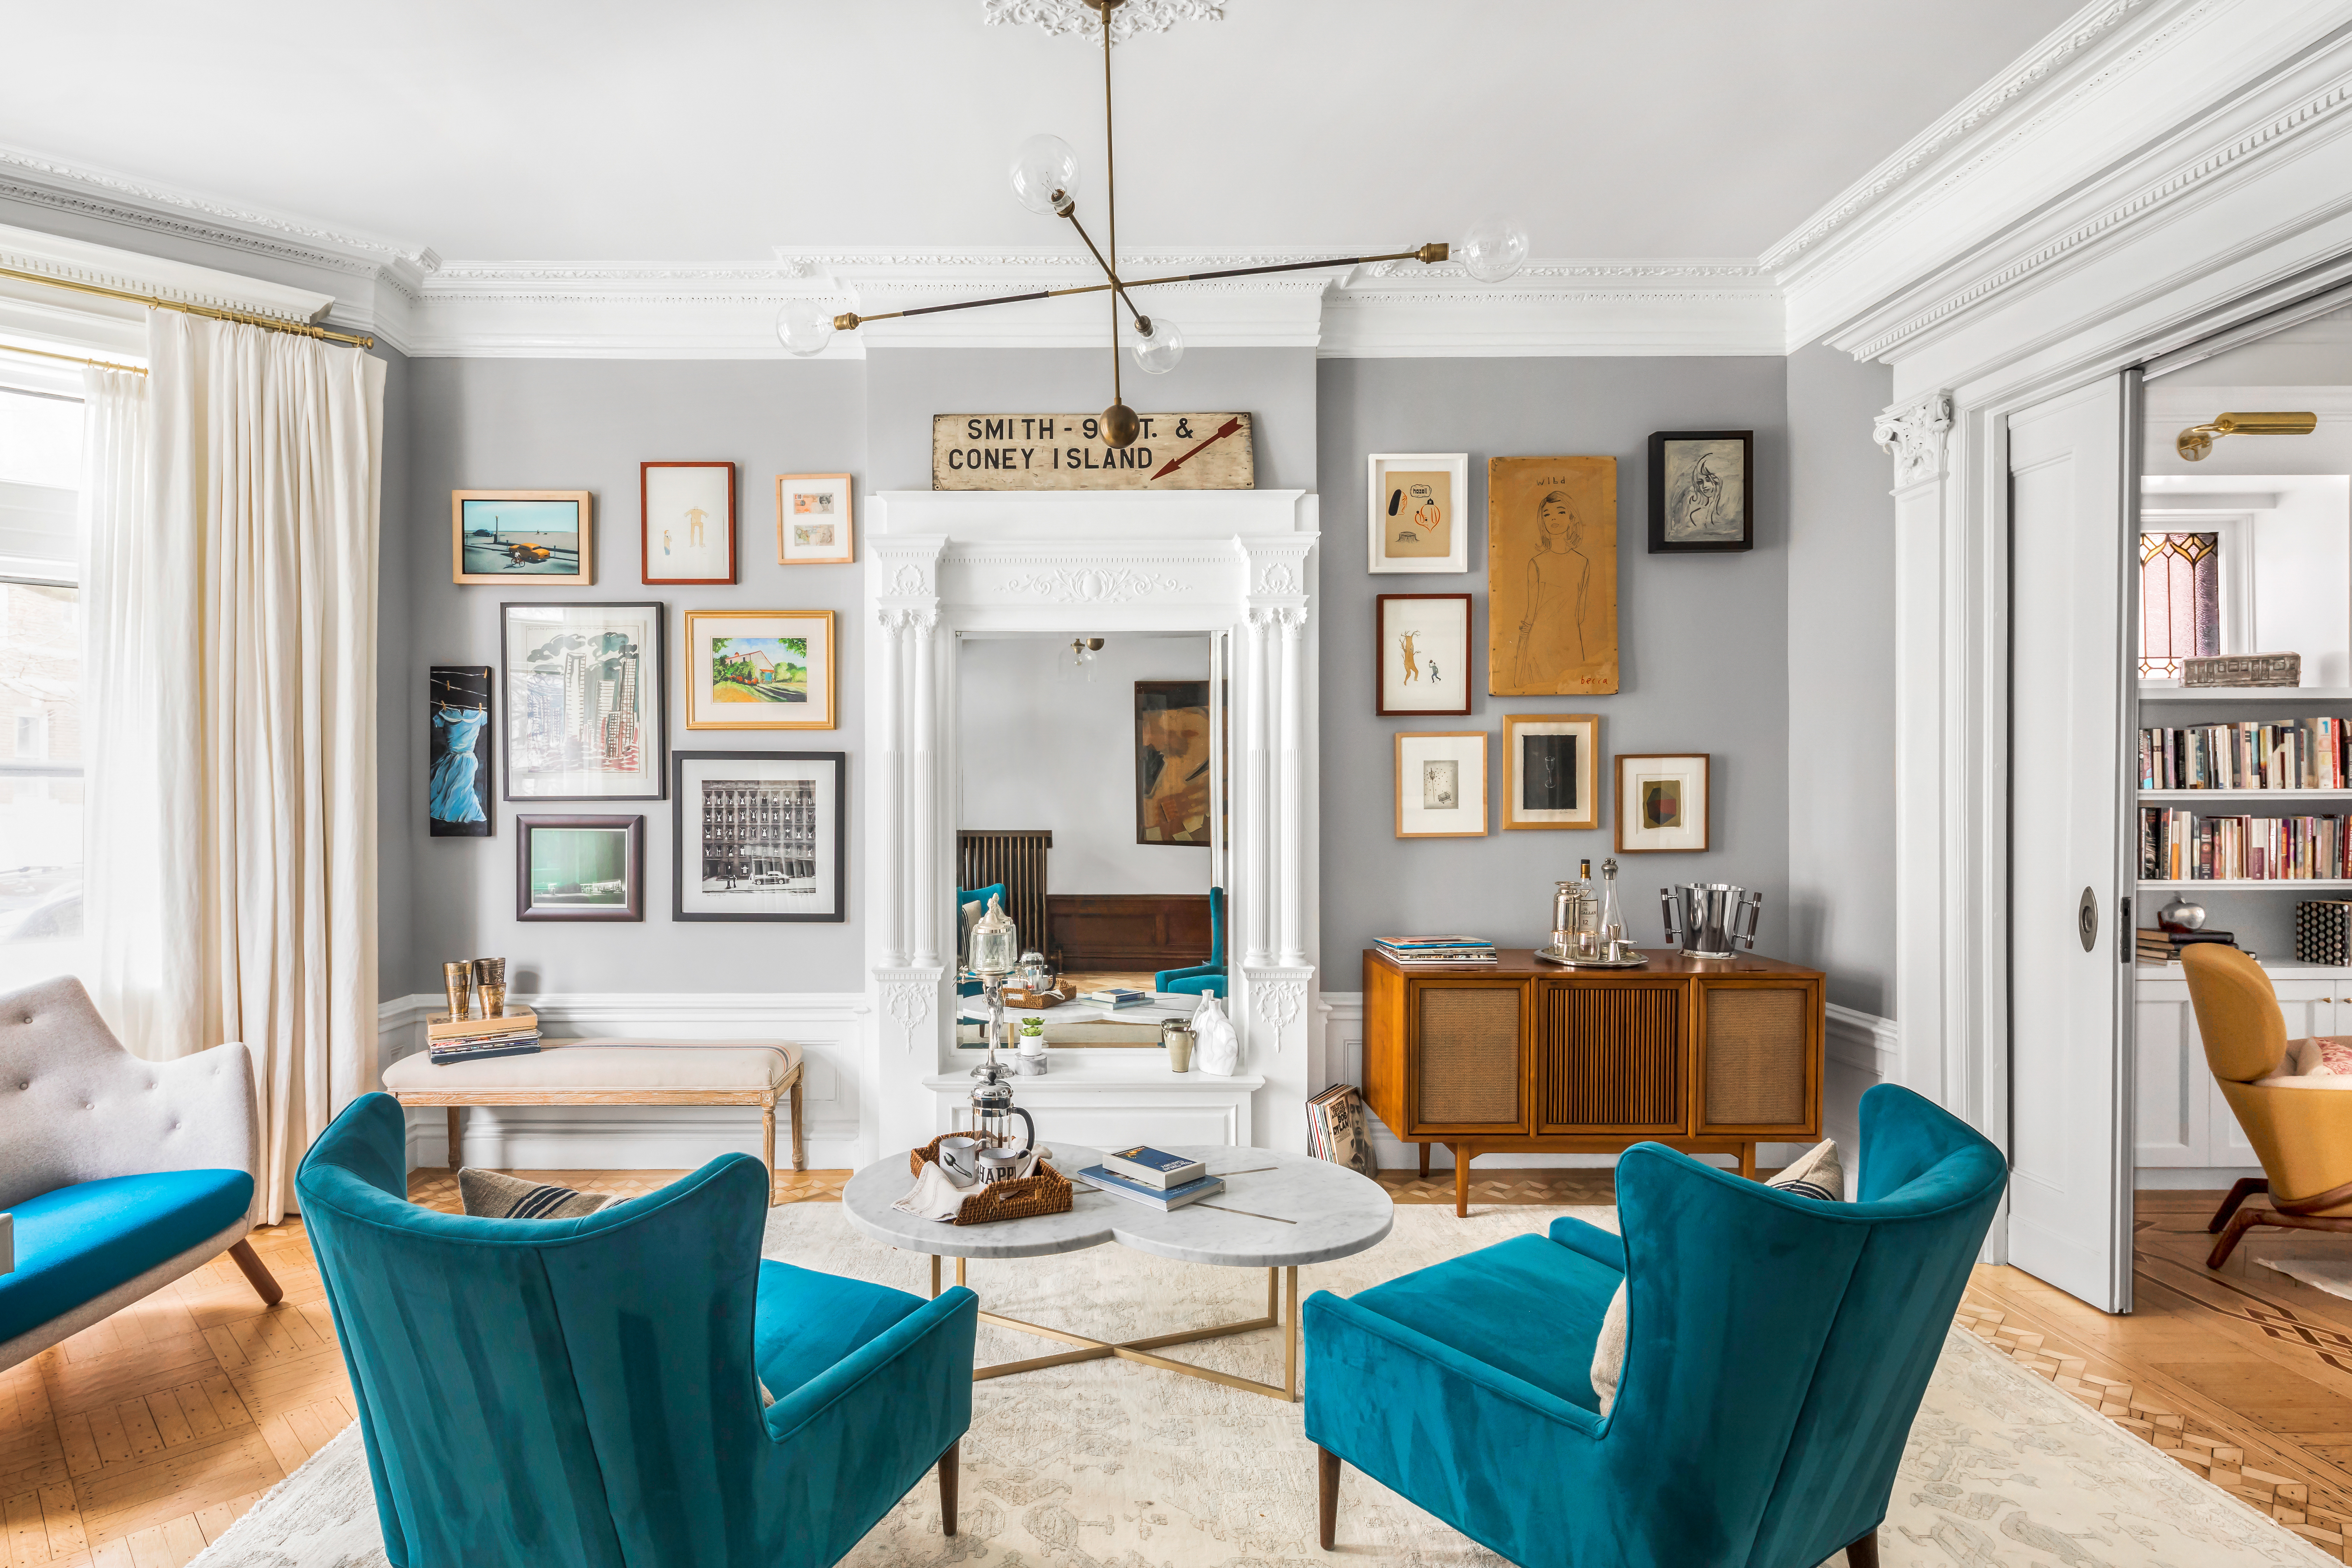 nyc celebrity homes curbed ny emily blunt and john krasinski list dreamy 8m park slope townhouse